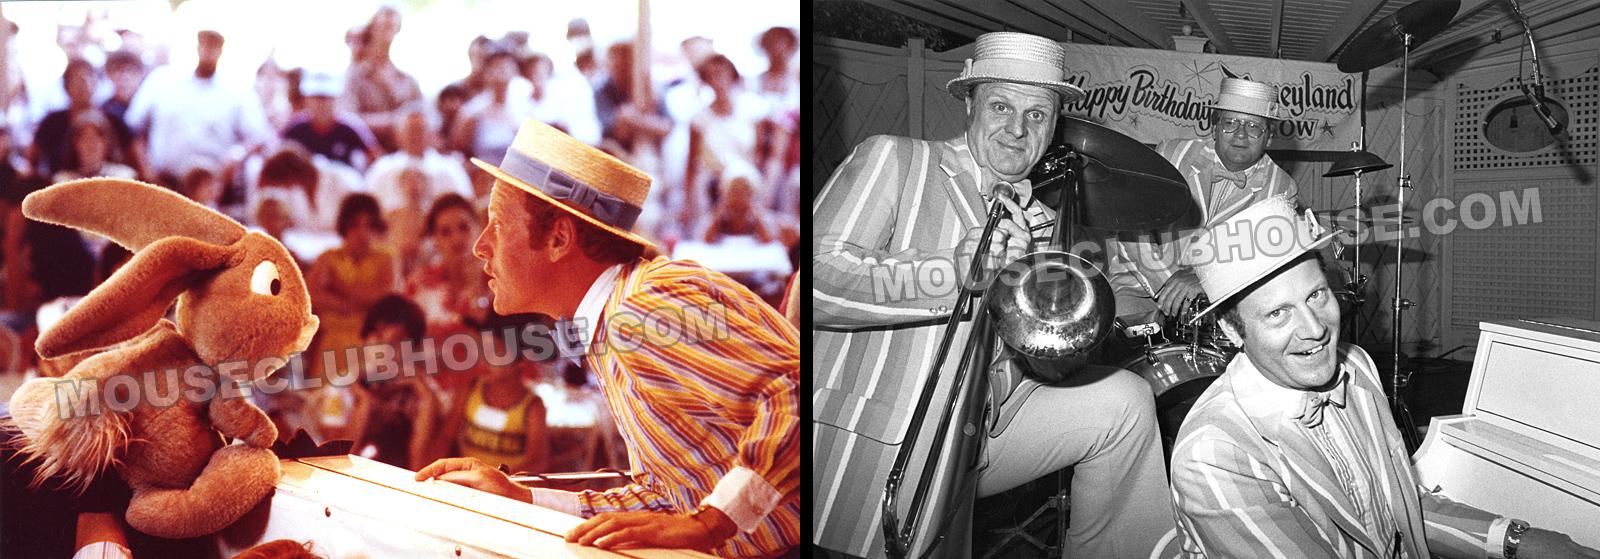 Ray Templin - Disneyland 25th Anniversary Character Show